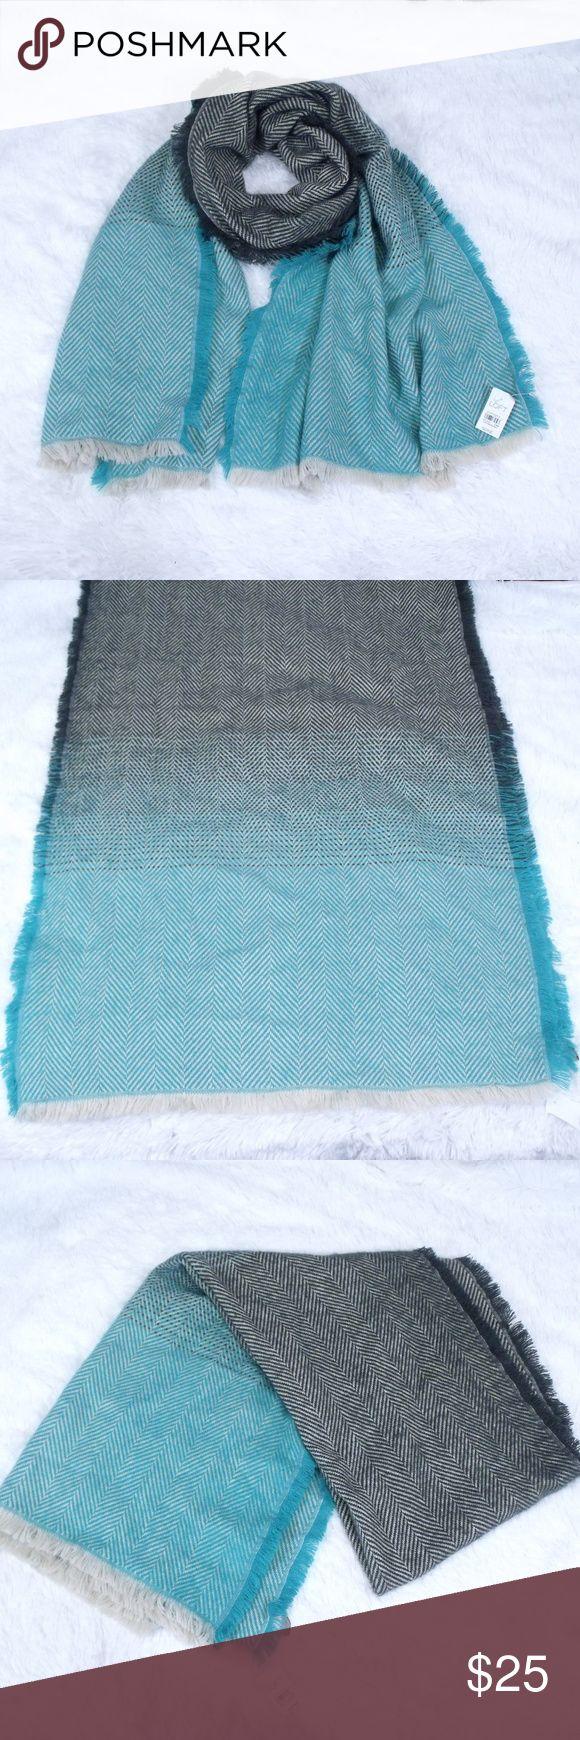 Ann Taylor Loft Blanket Scarf Ann Taylor Loft Blanket